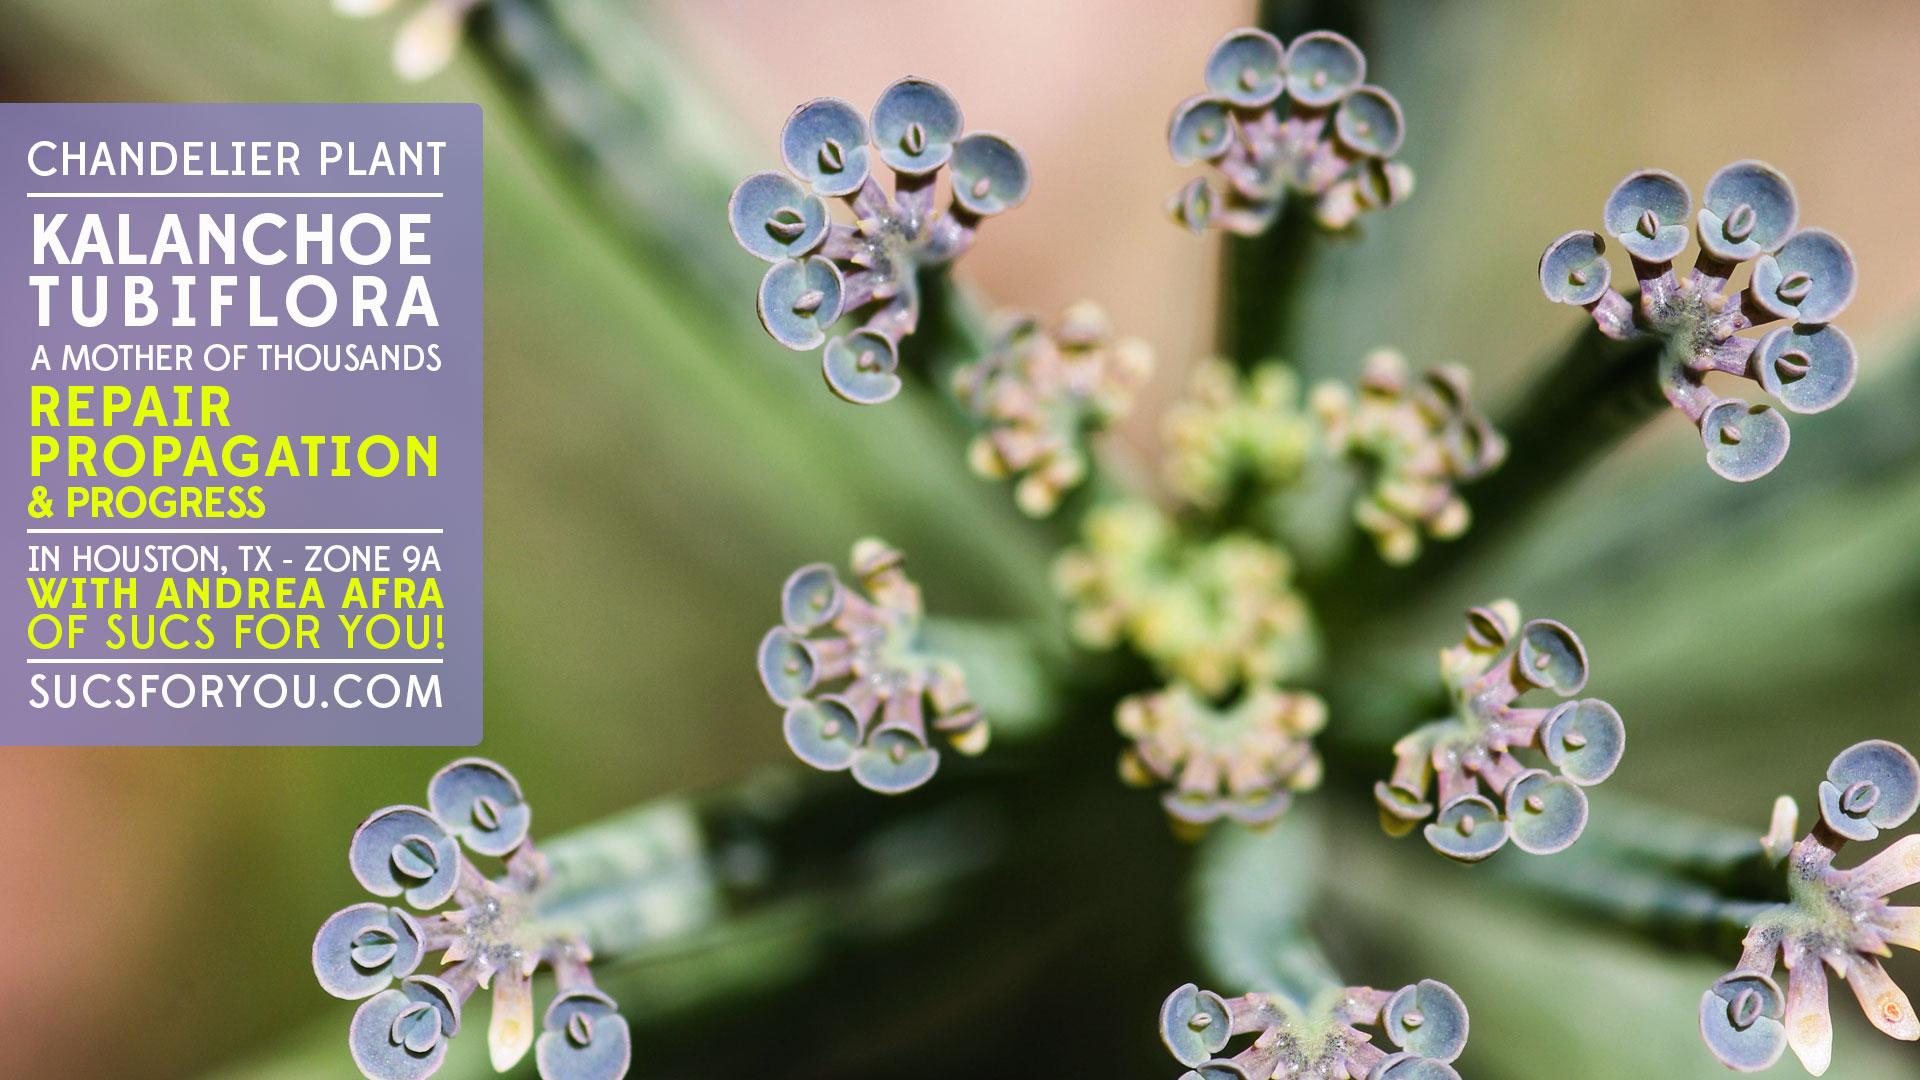 Kalanchoe tubiflora Mother of Thousands Chandelier plant